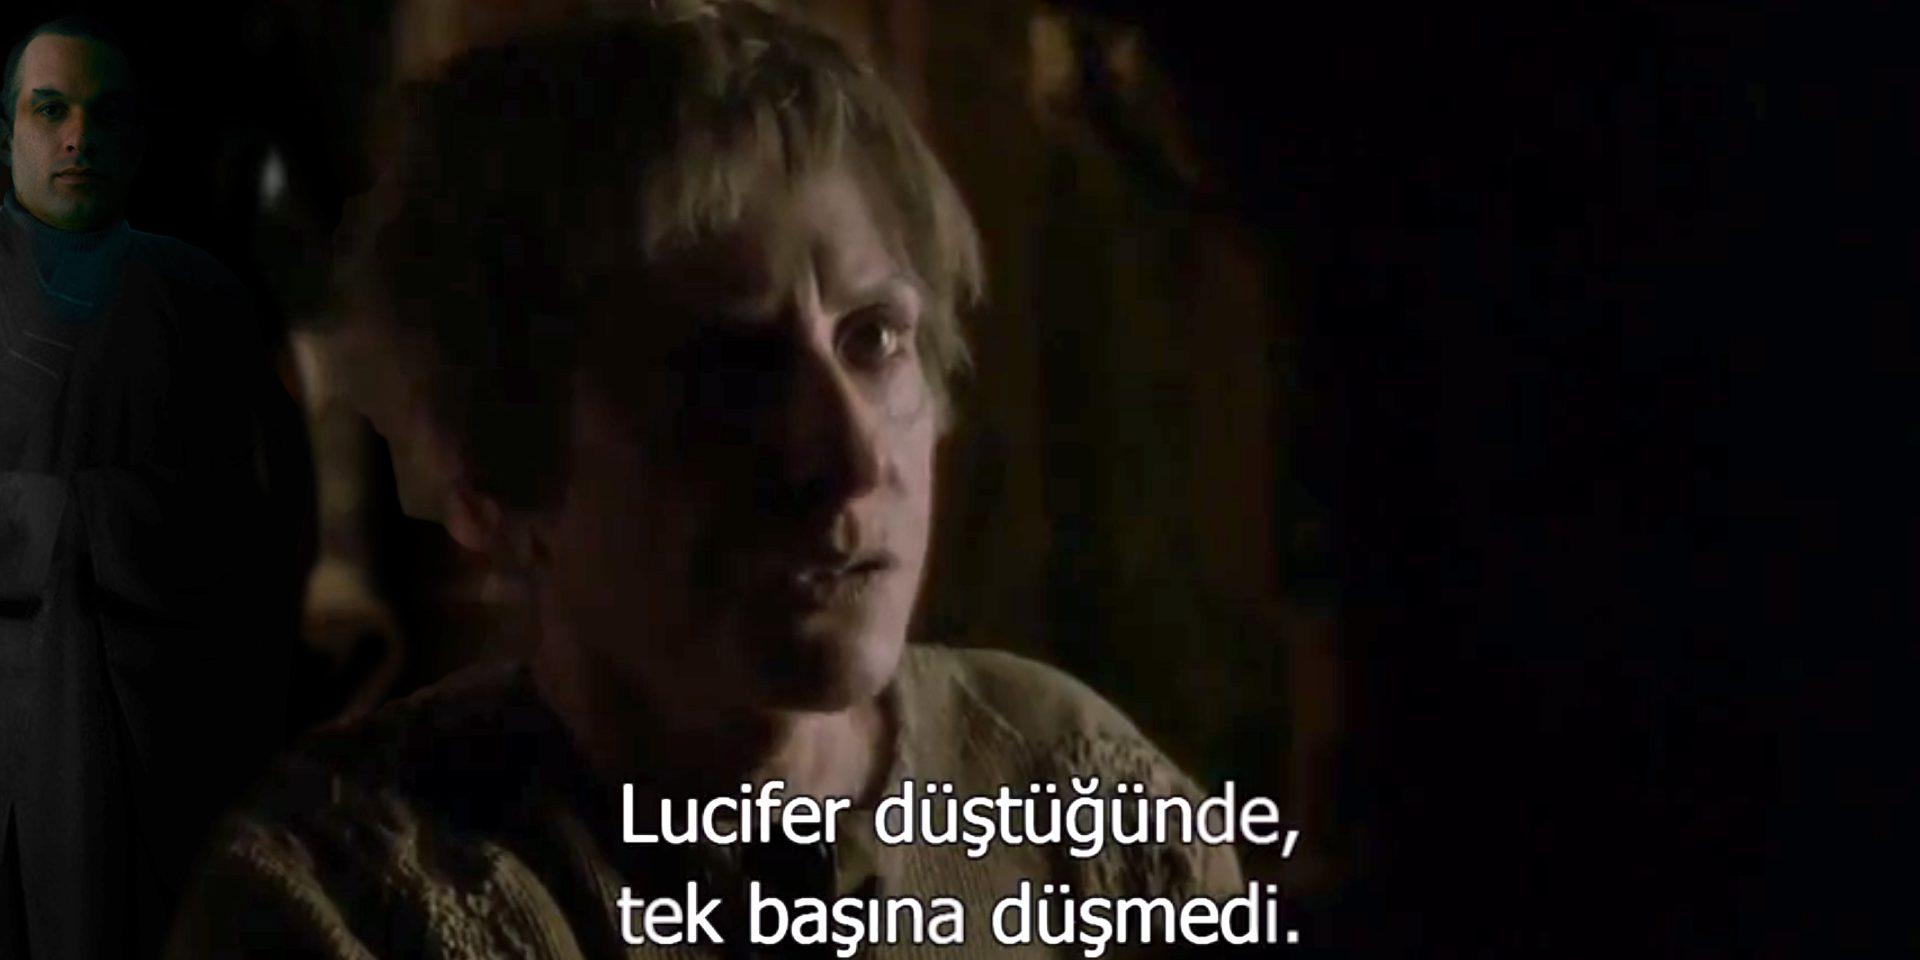 When Lucifer fell